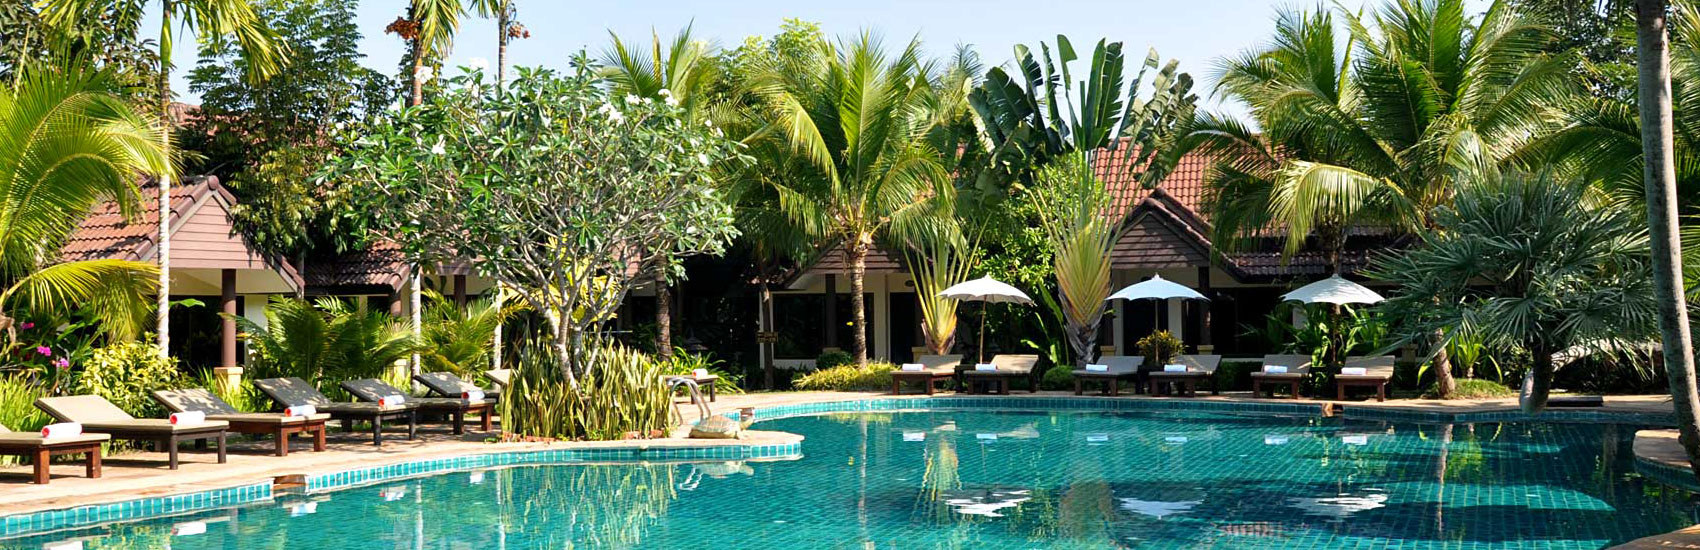 Chiang Rai - Laluna Hotel & Resort, Chiang Rai, Resort Chiang Rai,